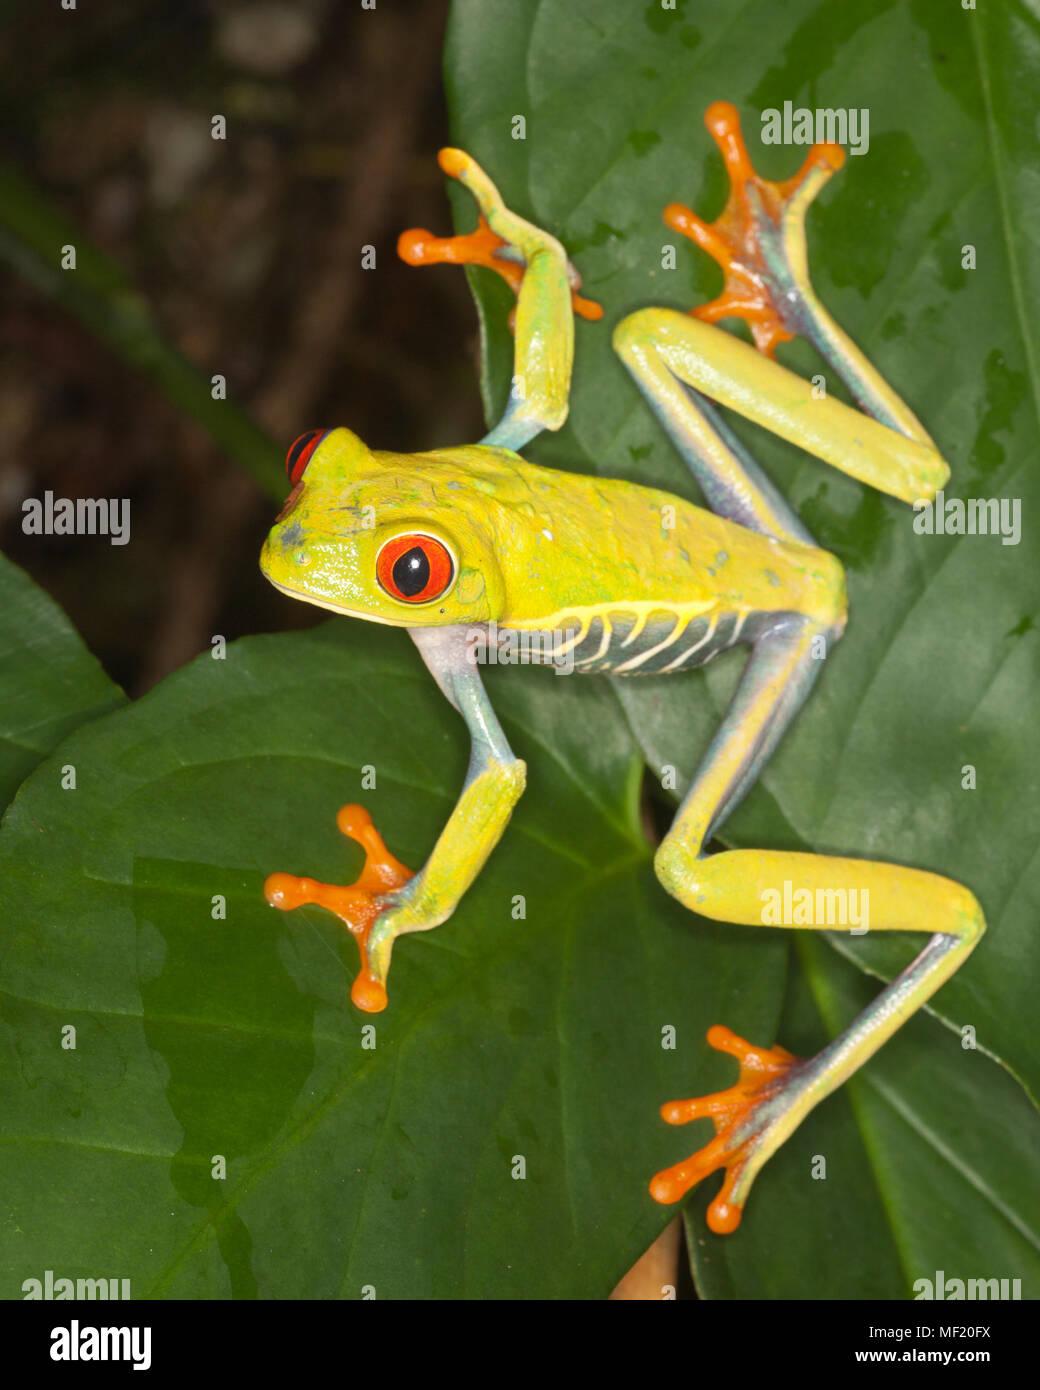 Red-eyed Tree frog (Agalychnis callidryas) on leaf in rainforest - Stock Image